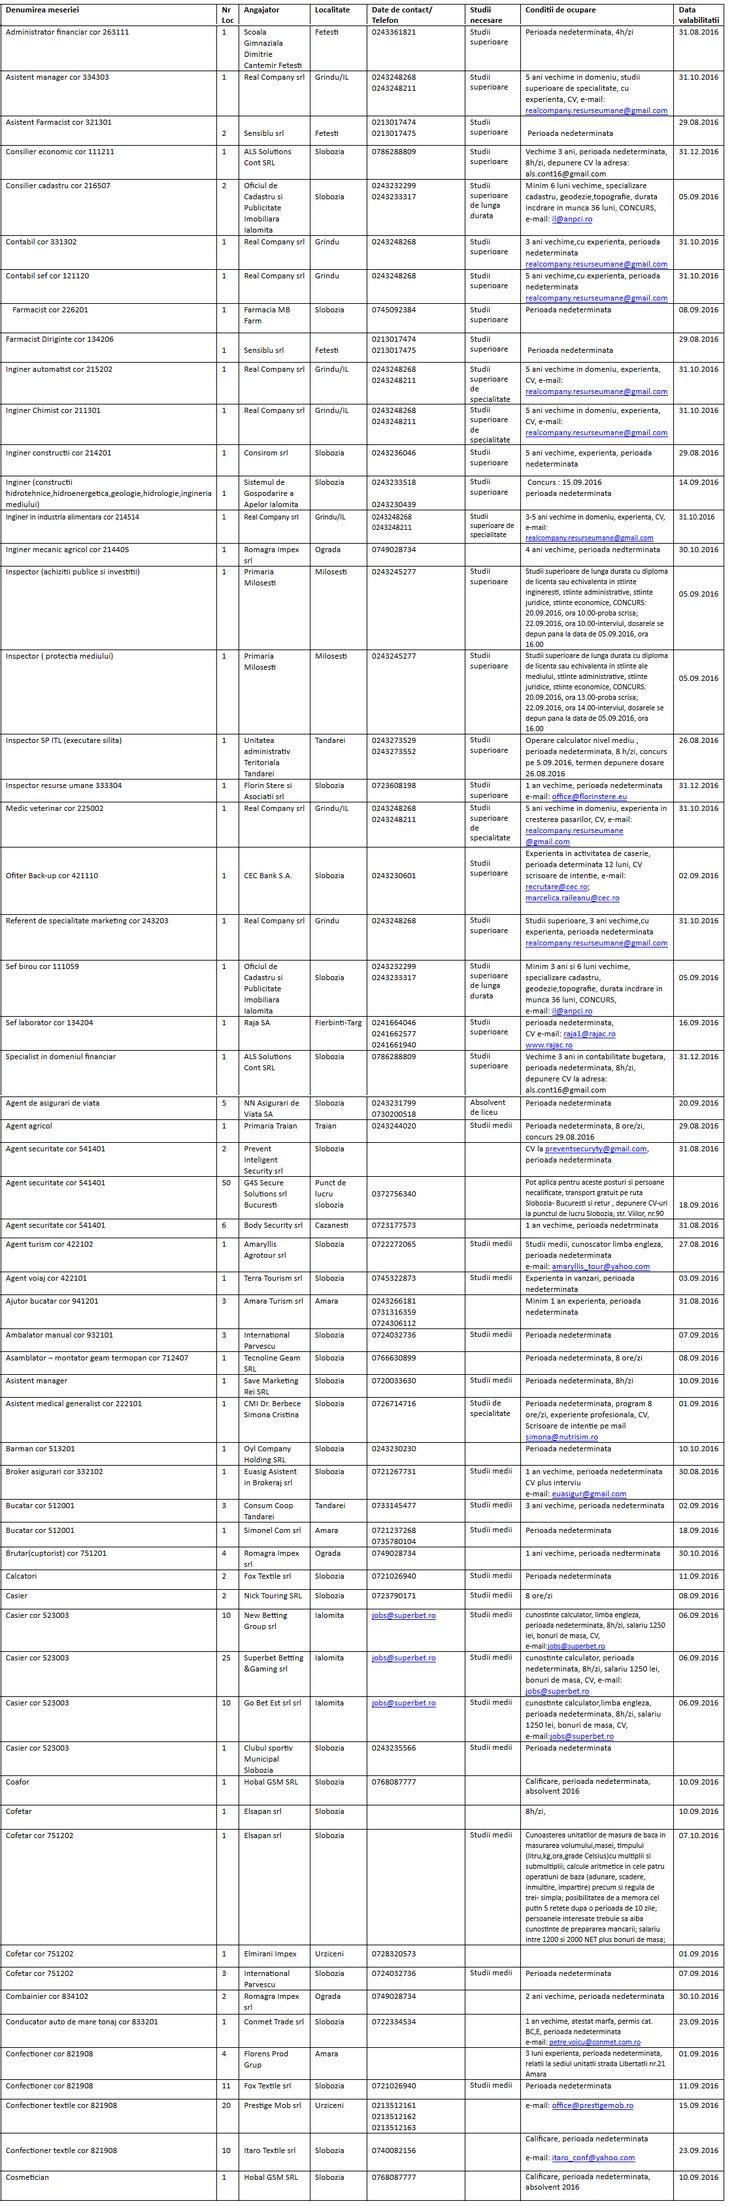 Locuri de munca noi in judetul Ialomita (Fetesti, Slobozia, Urziceni, Grindu, etc). Gasiti lista aici: https://www.meritangajat.ro/pg/articole/admin/read/36584/locuri-de-munca-in-fetesti-slobozia-urziceni-grindu-judetul-ialomita